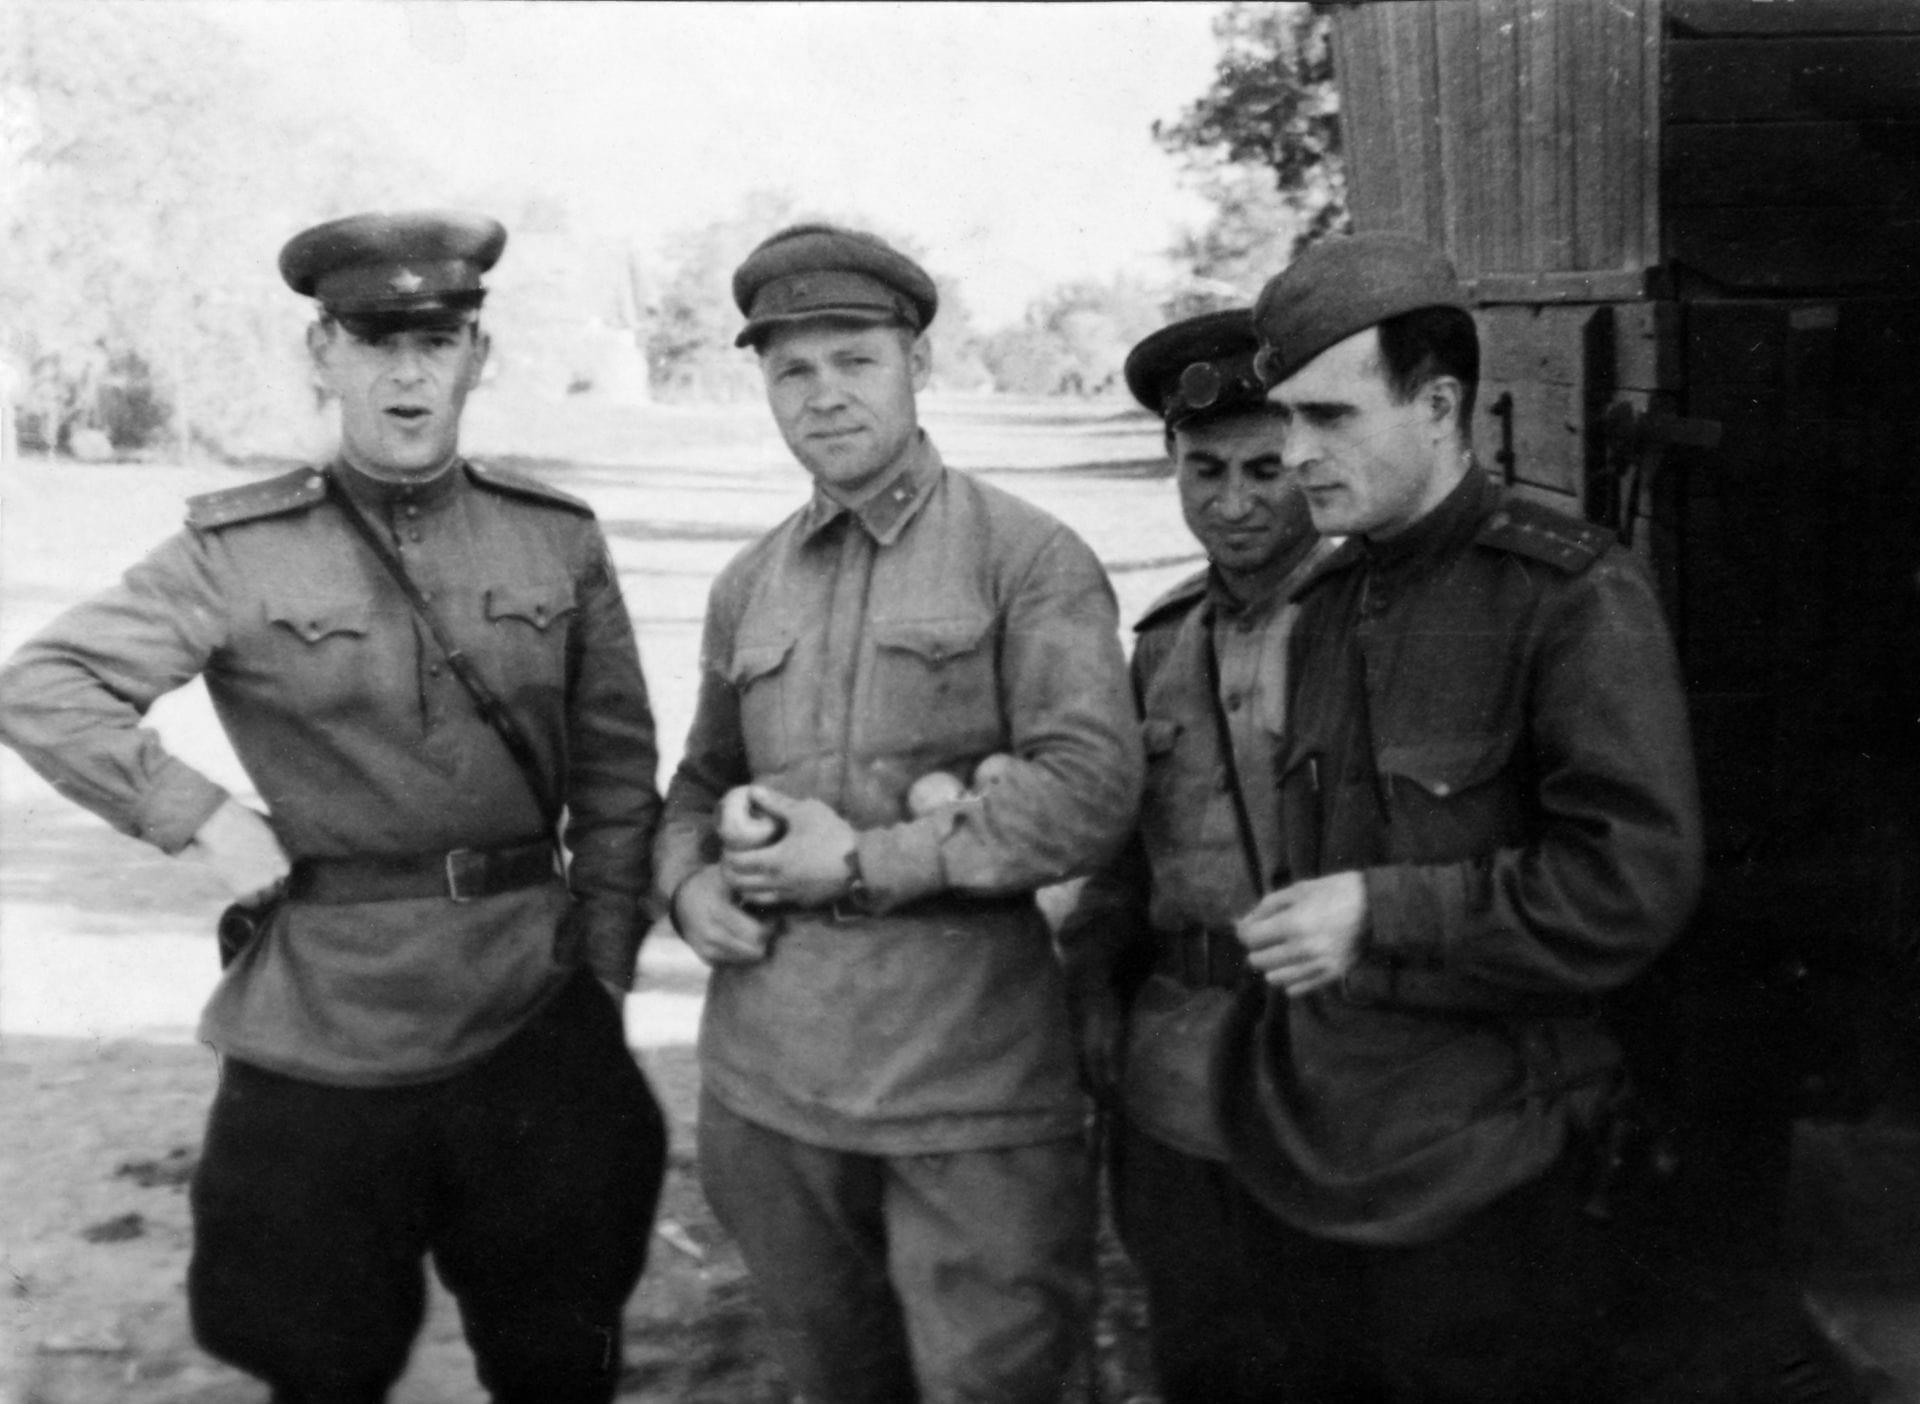 Экспонат #18. Киногруппа 3-го Украинского фронта: Брантман, Капкин, Грачев. 1943 год